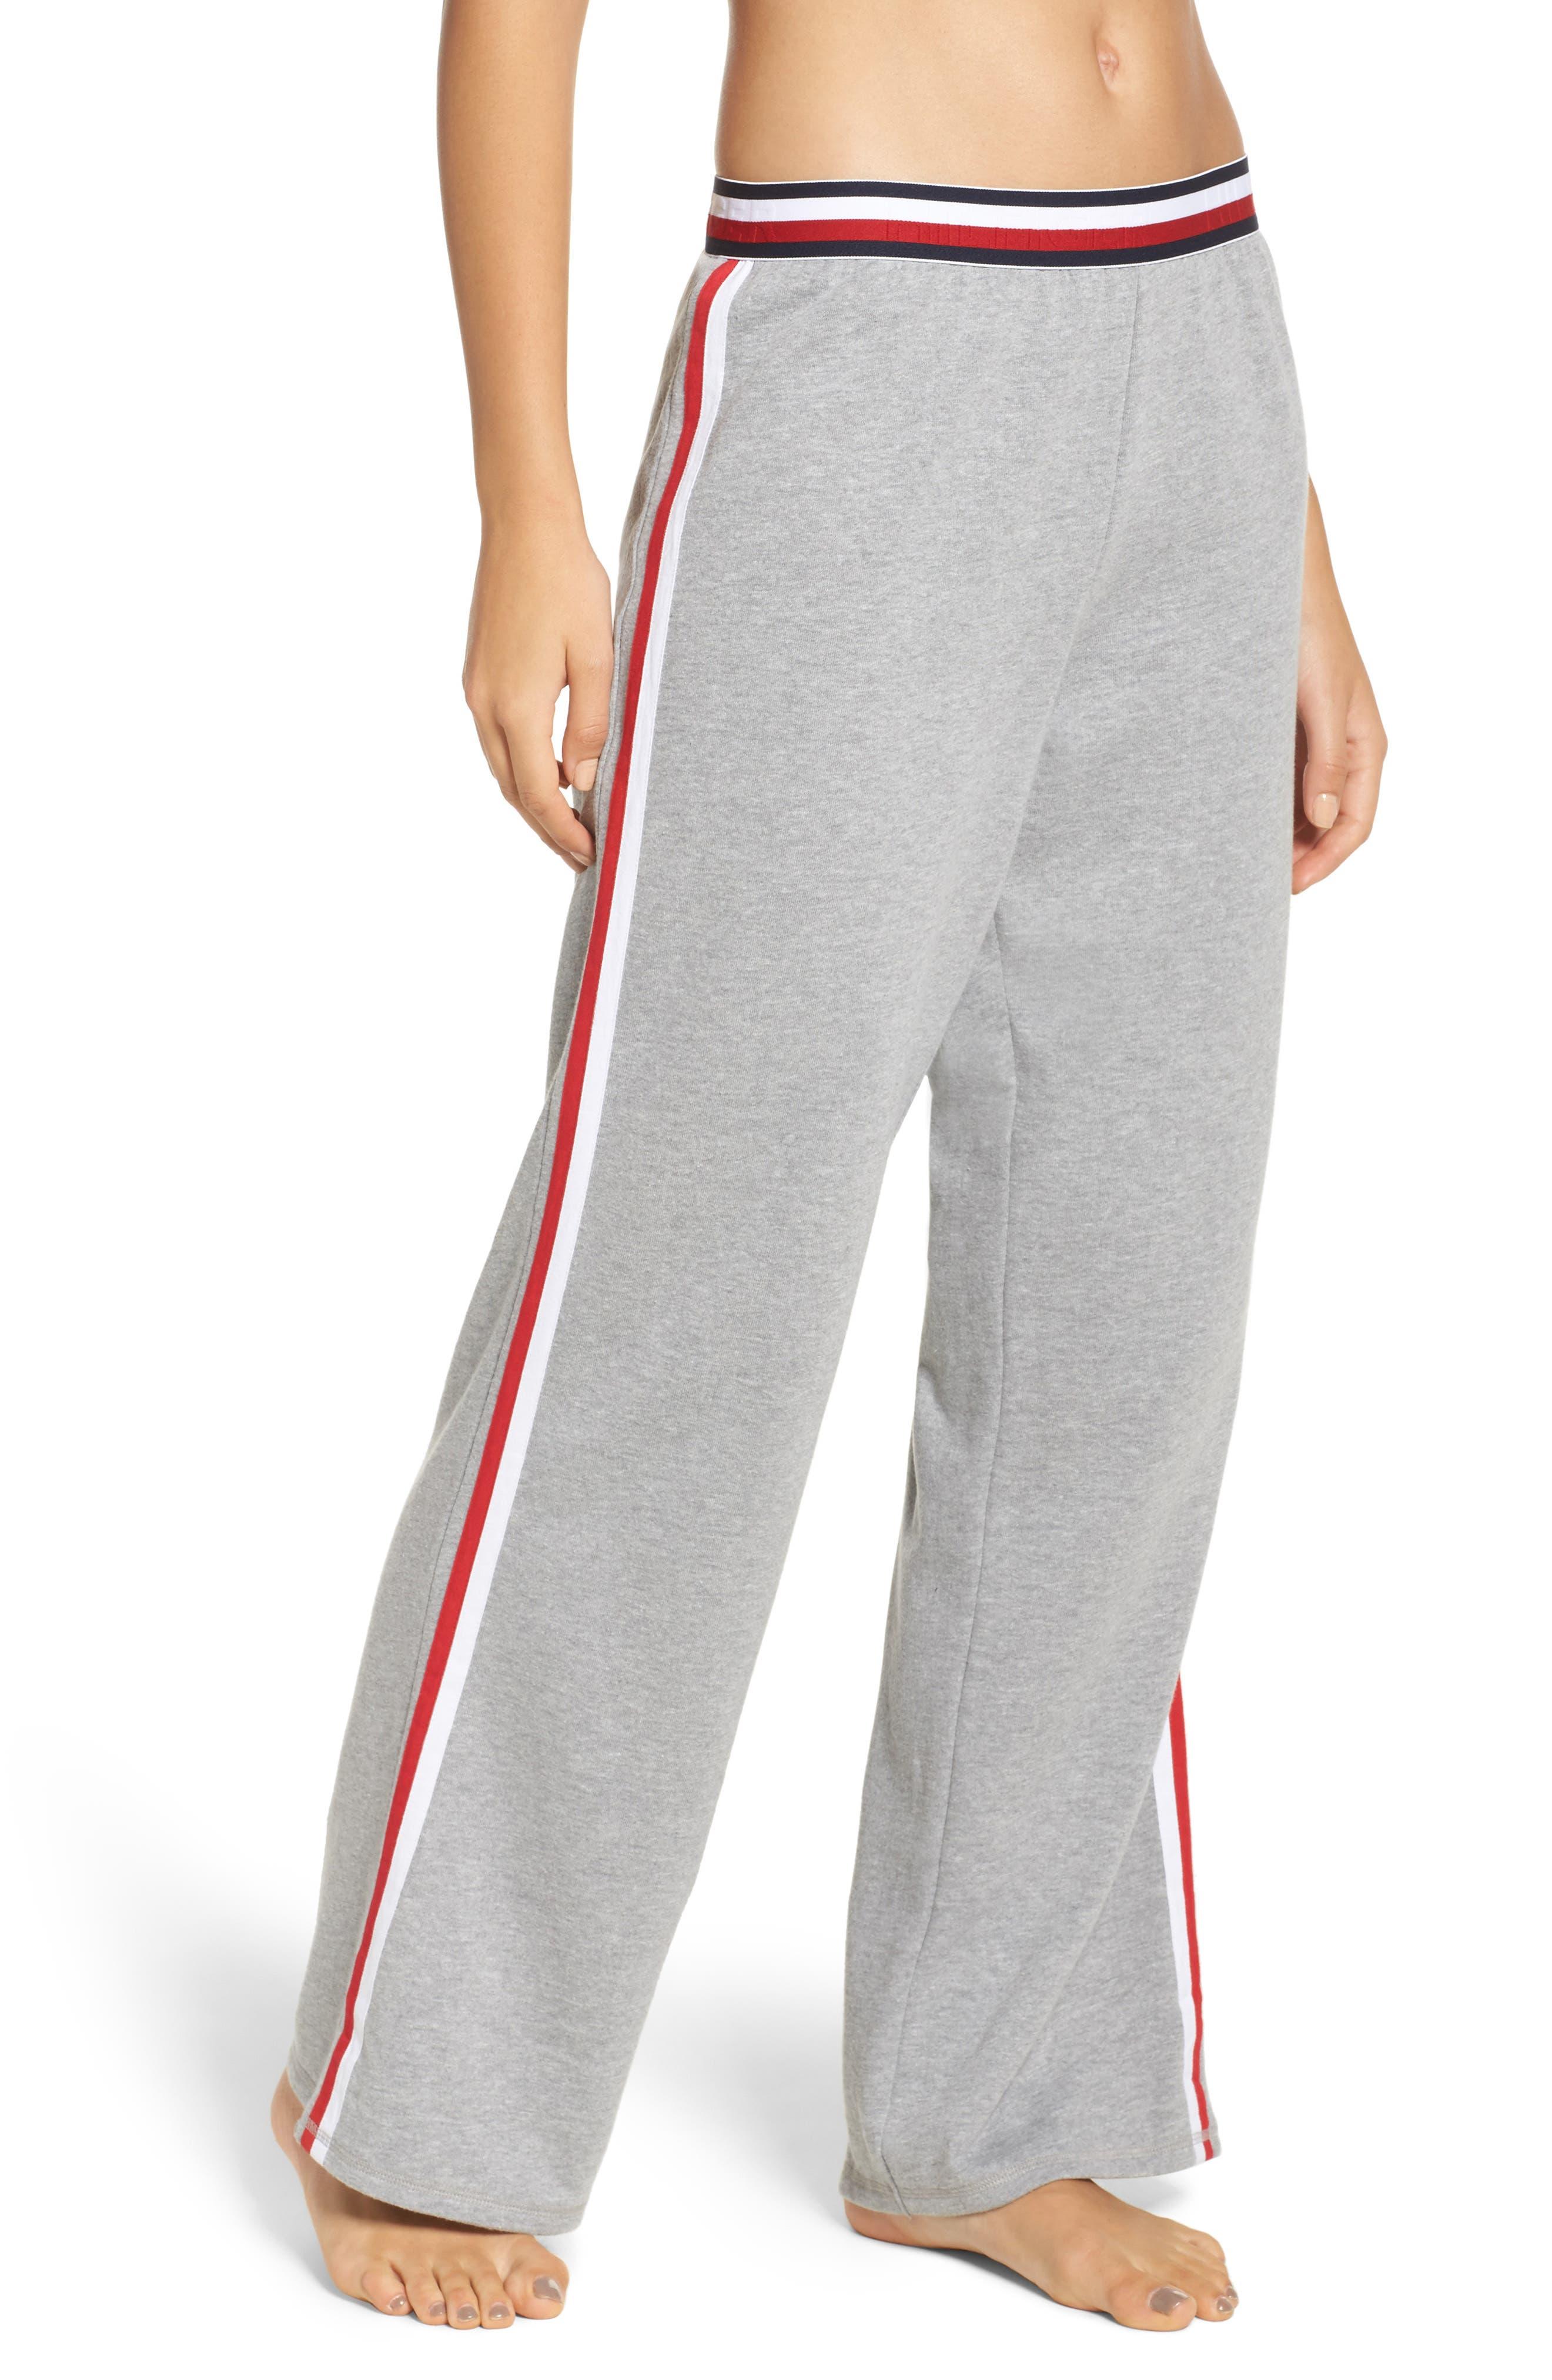 Lounge Pants,                             Main thumbnail 1, color,                             Heather Grey